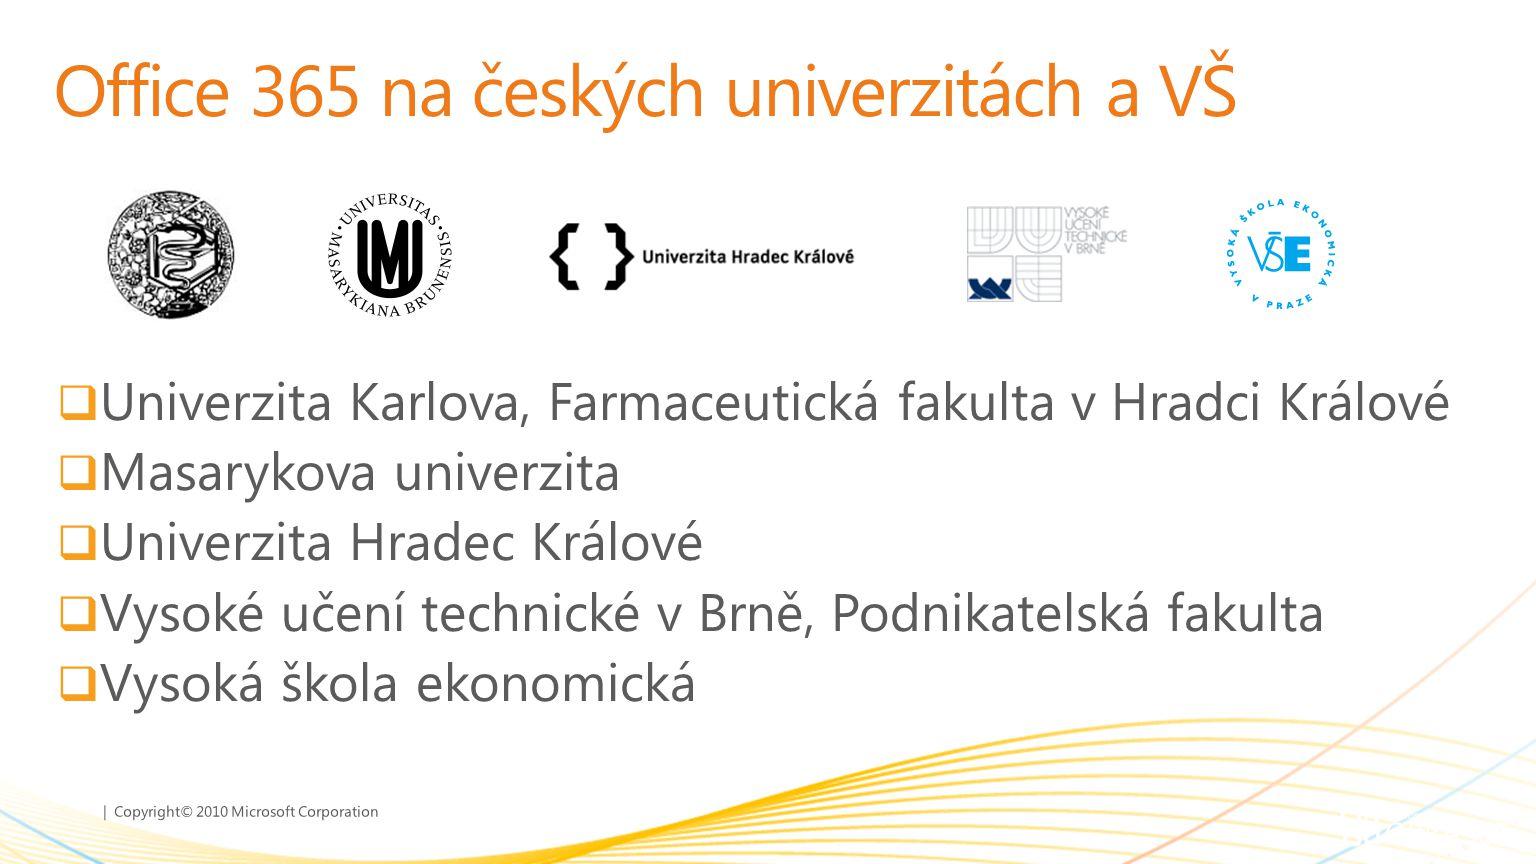 Office 365 na českých univerzitách a VŠ